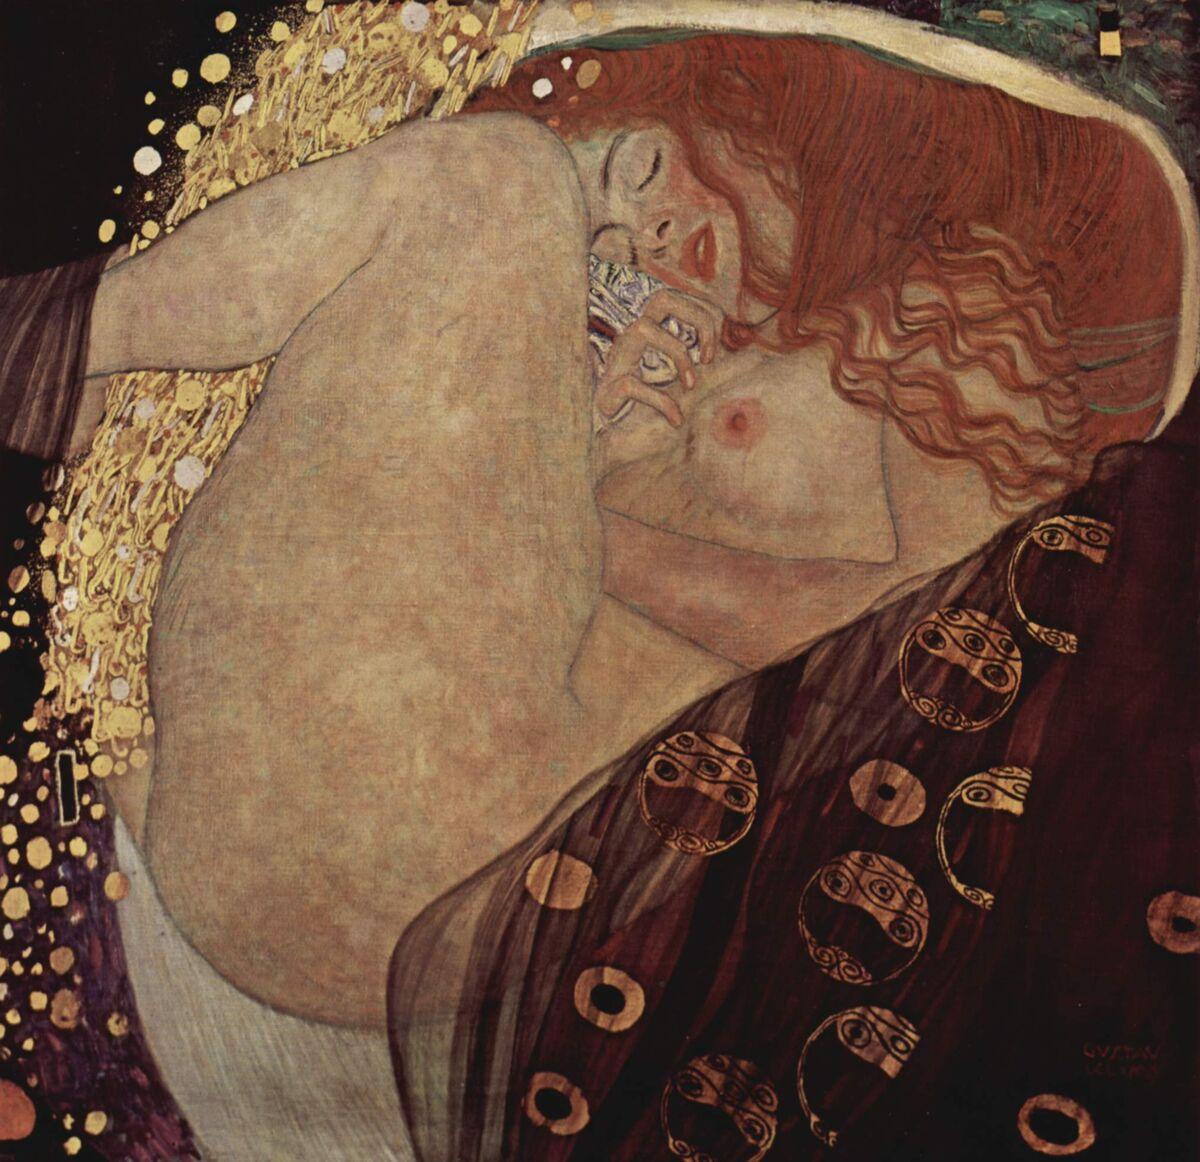 Gustav Klimt, Danae, 1907–08. Image via Wikimedia Commons.